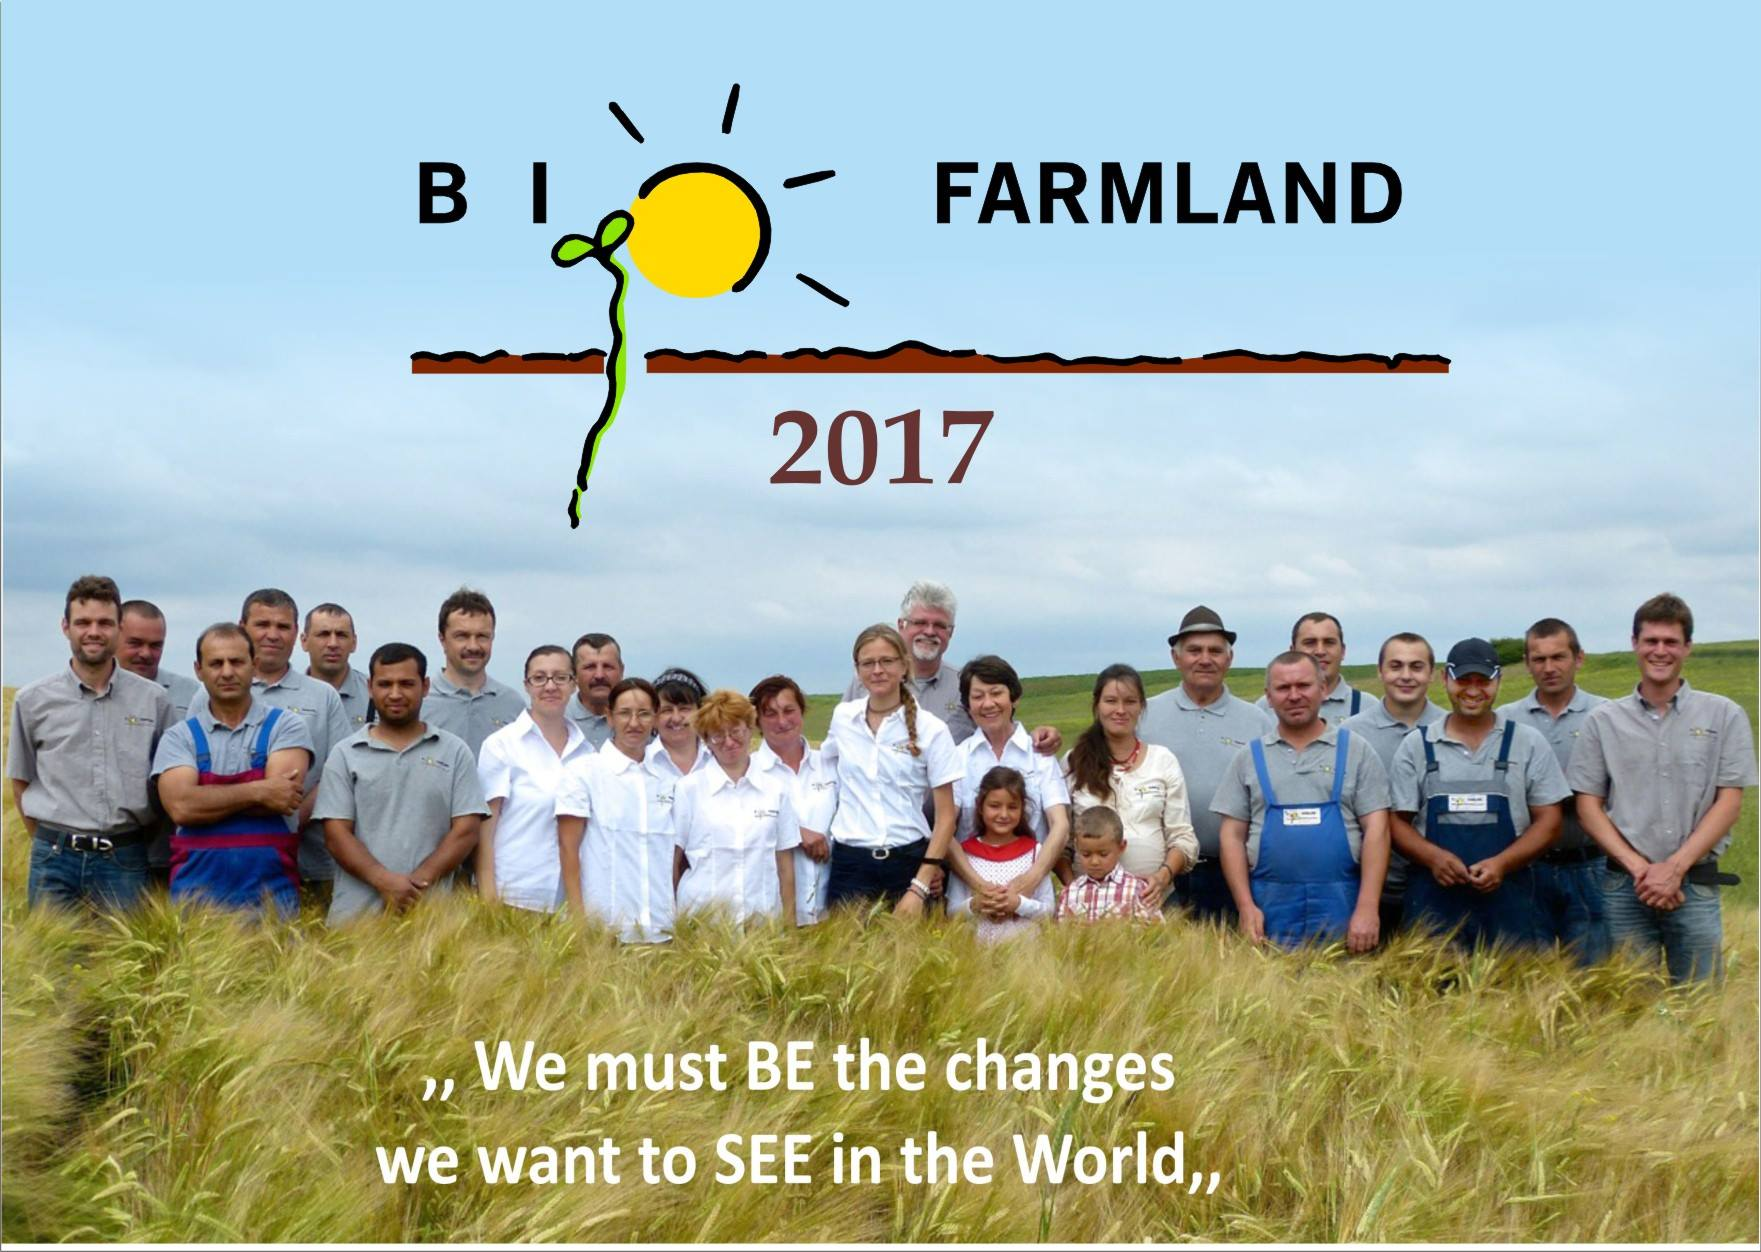 Biofarmland Manufactura